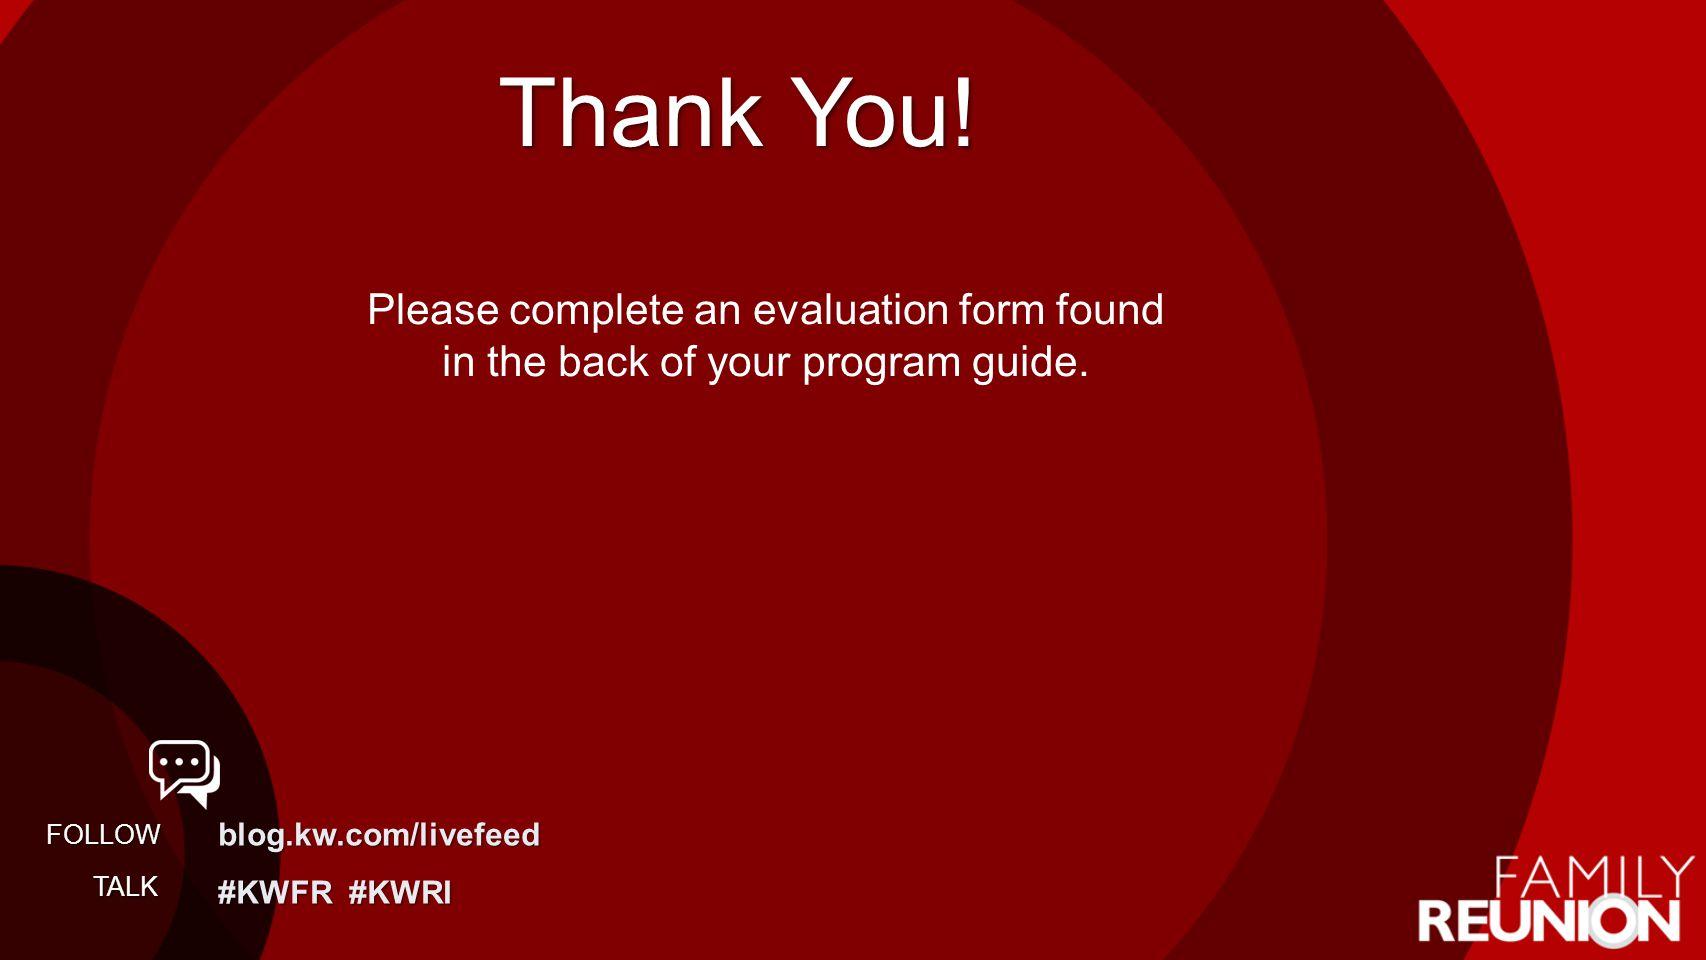 blog.kw.com/livefeed #KWFR #KWRI FOLLOW TALK Thank You.